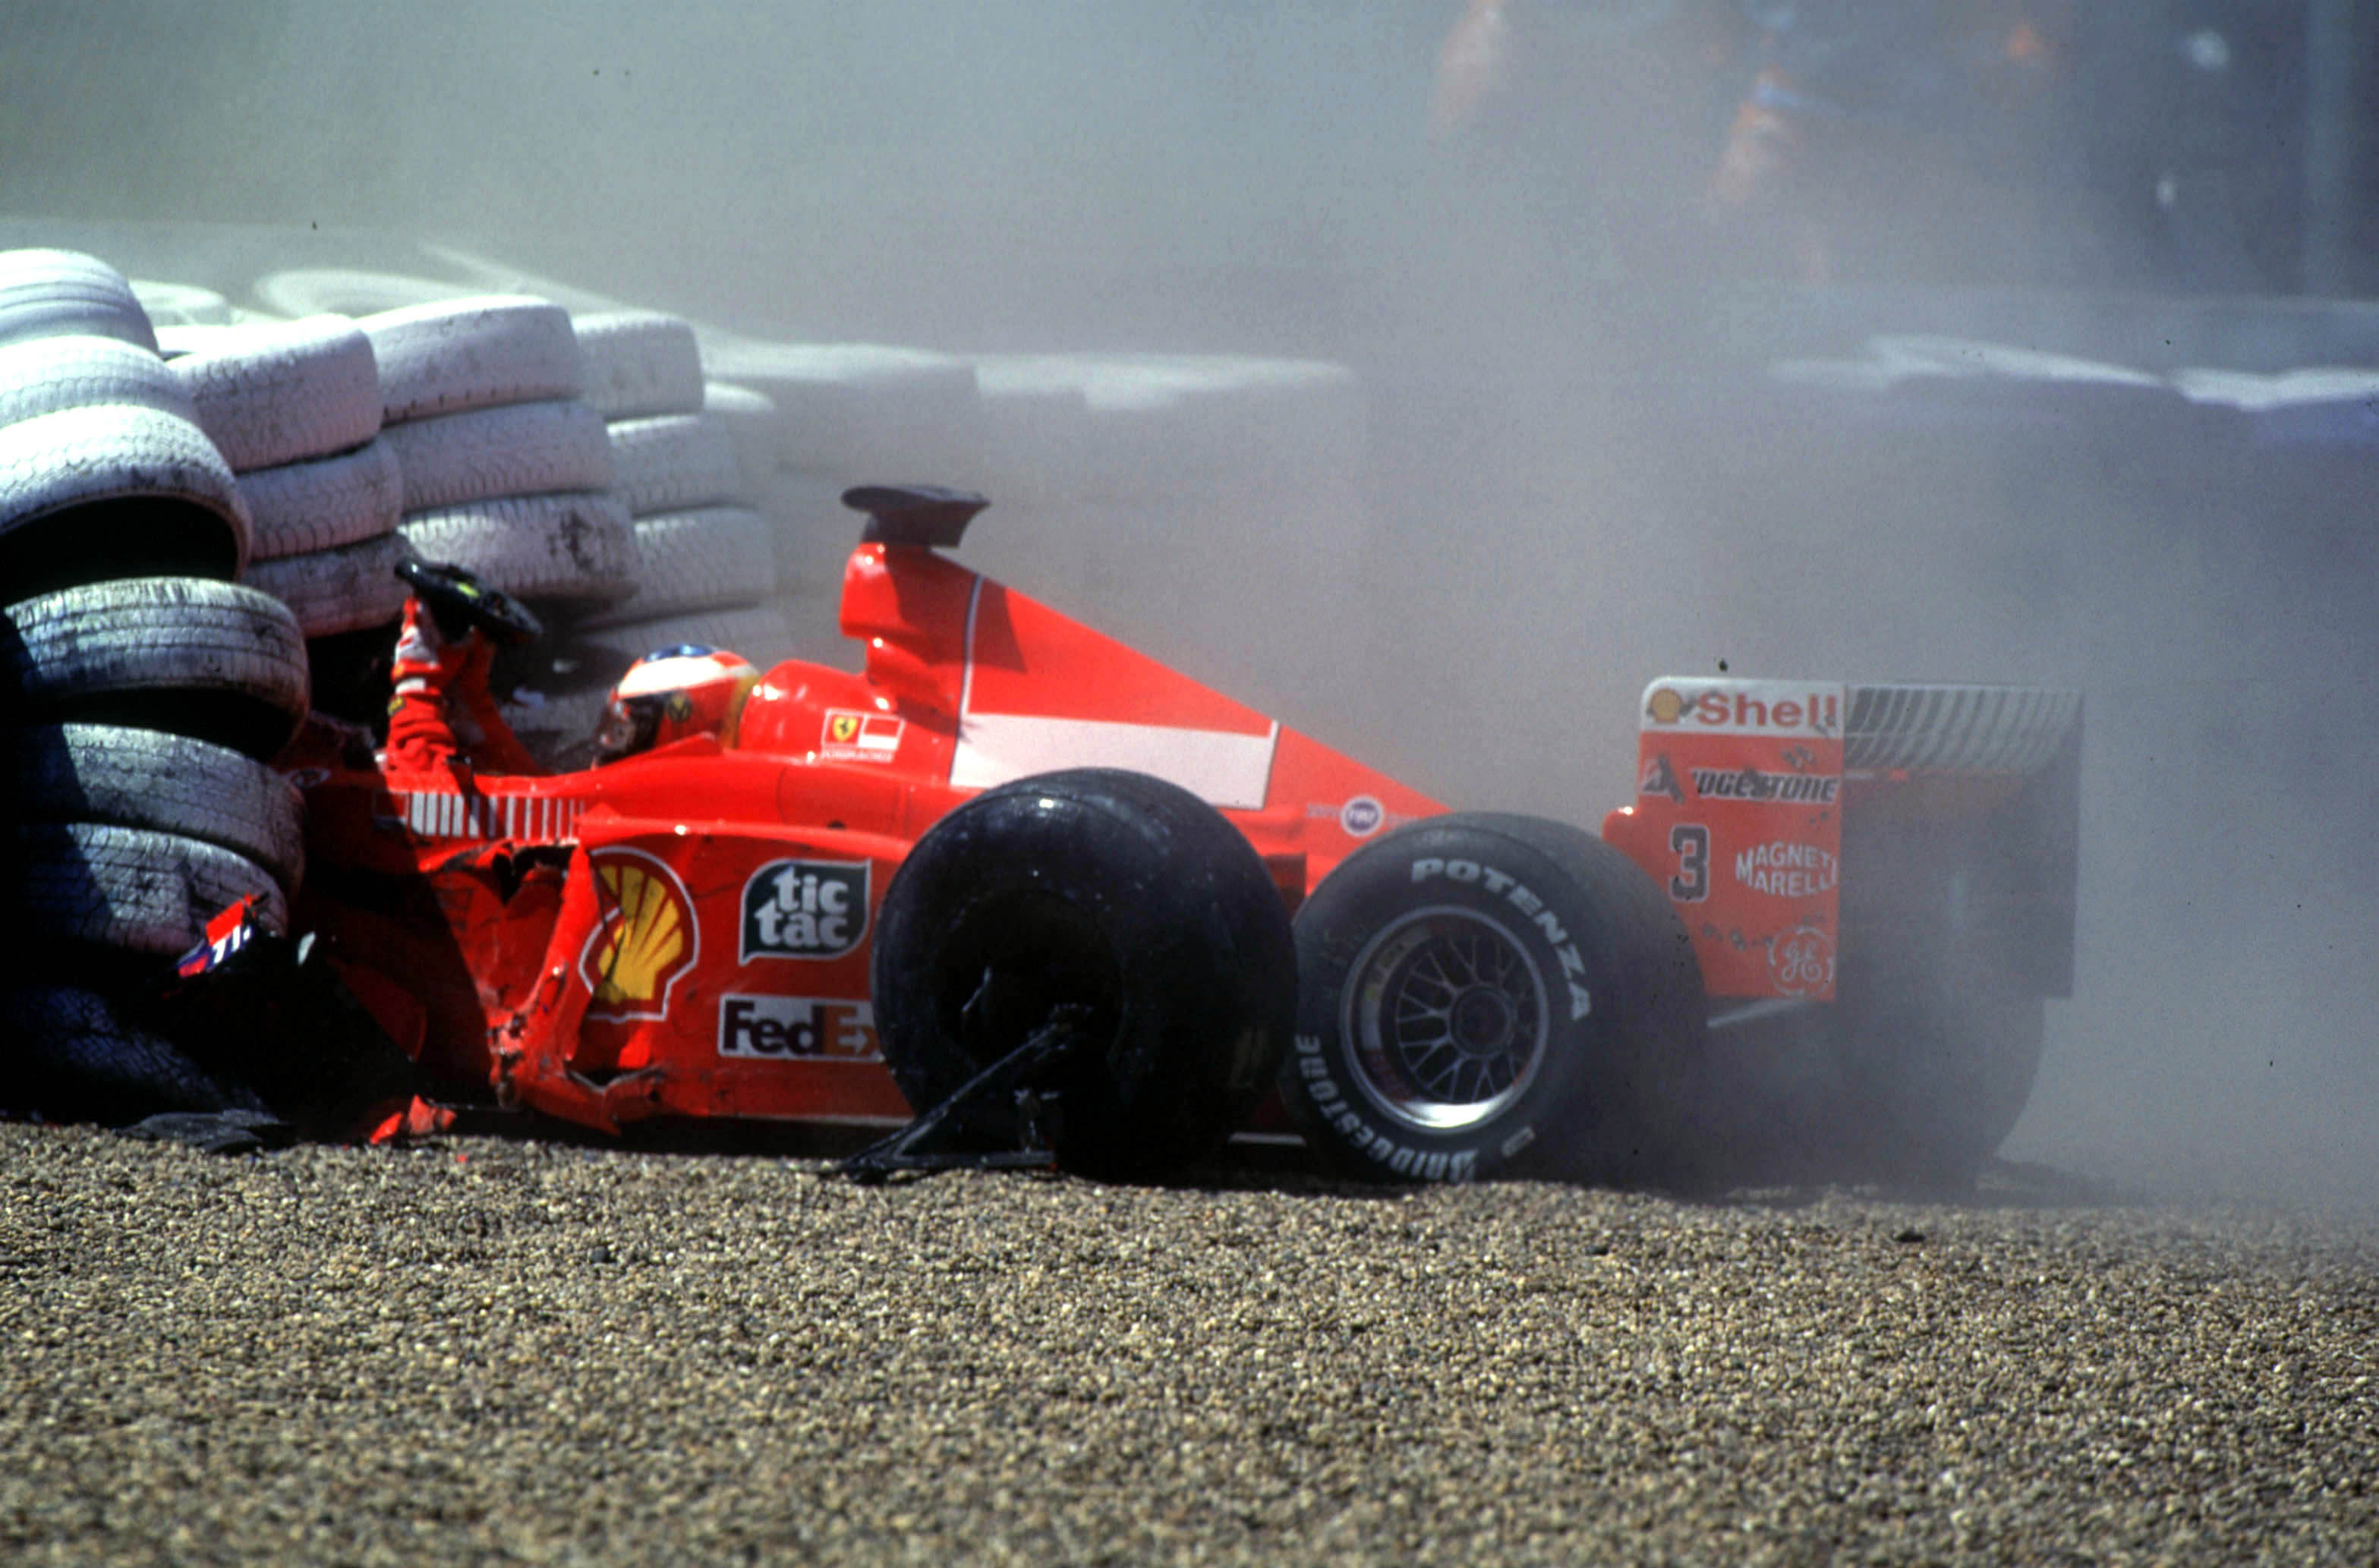 Michael Schumacher Ferrari crash British Grand Prix 1999 Silverstone